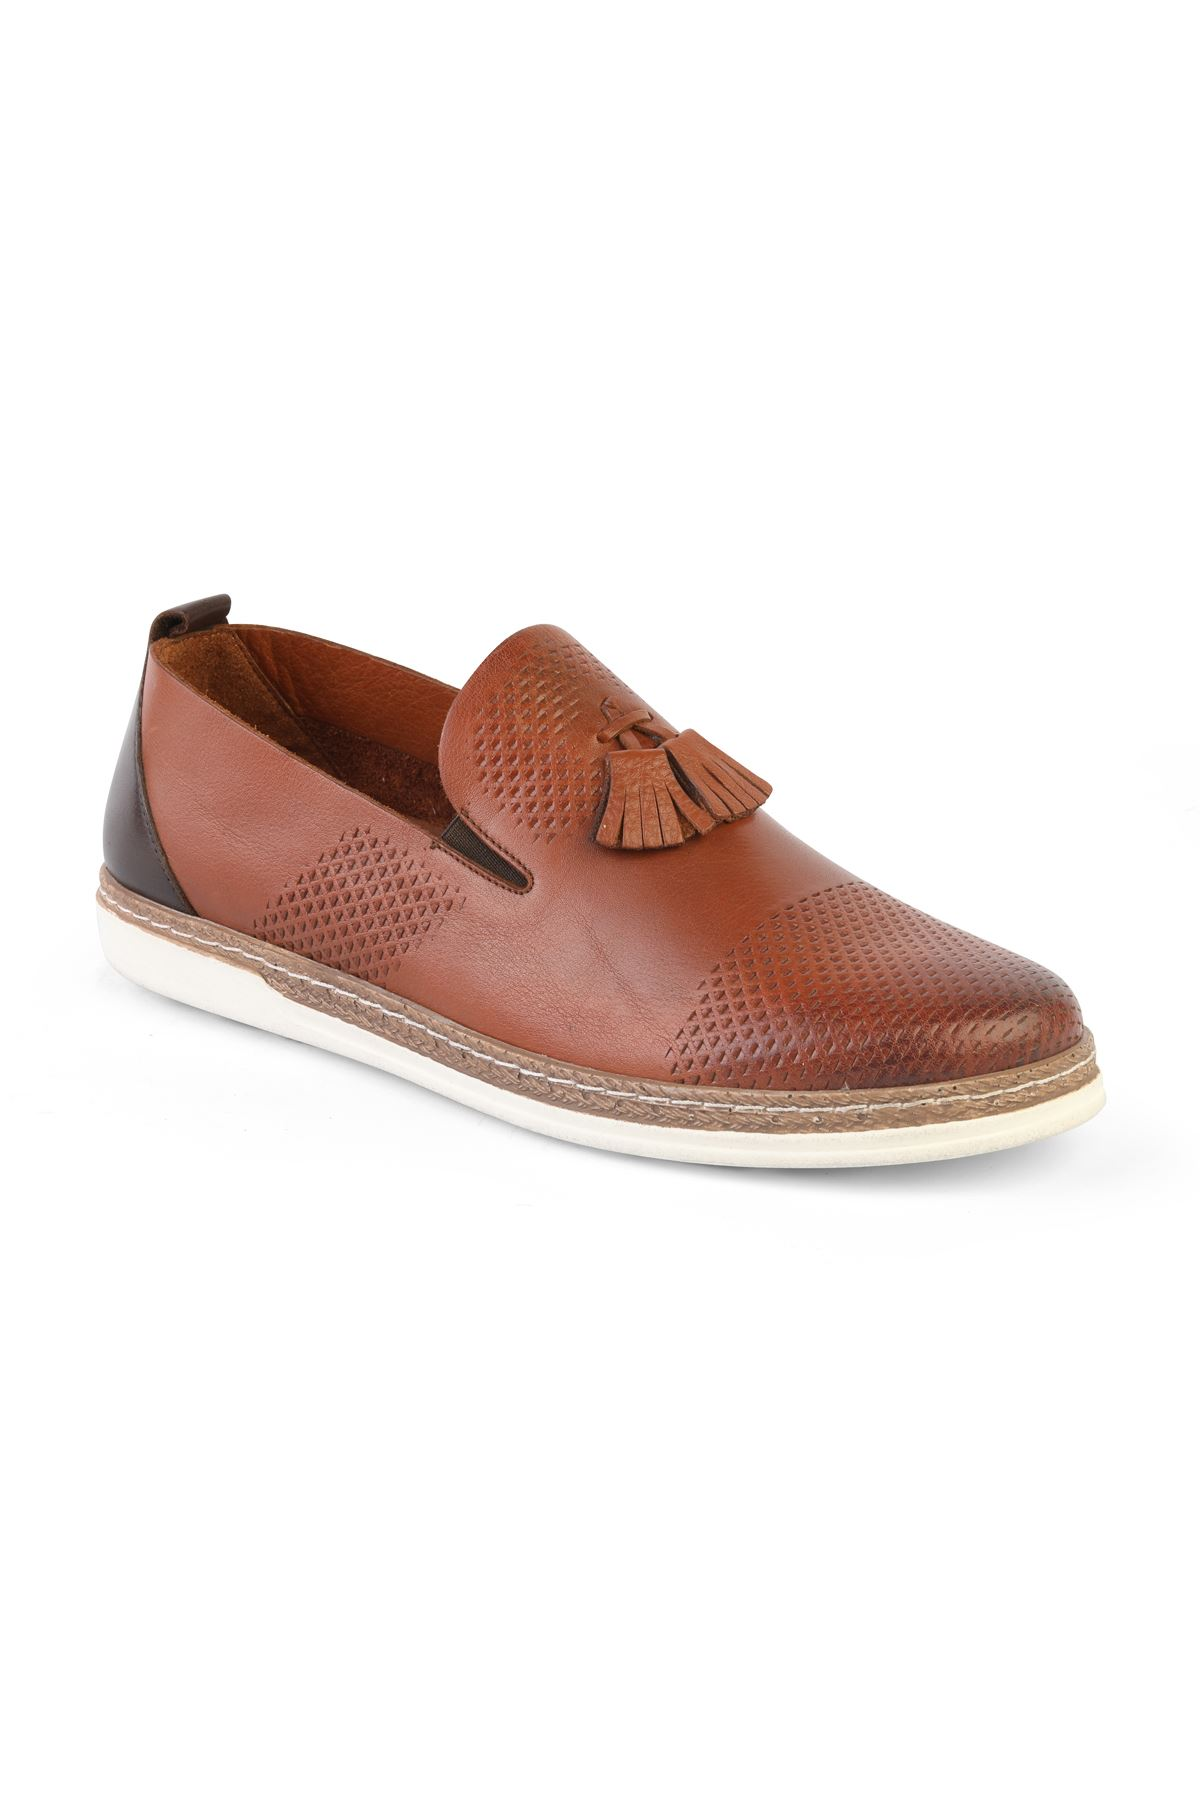 Libero T1206 Tan Loafer Shoes